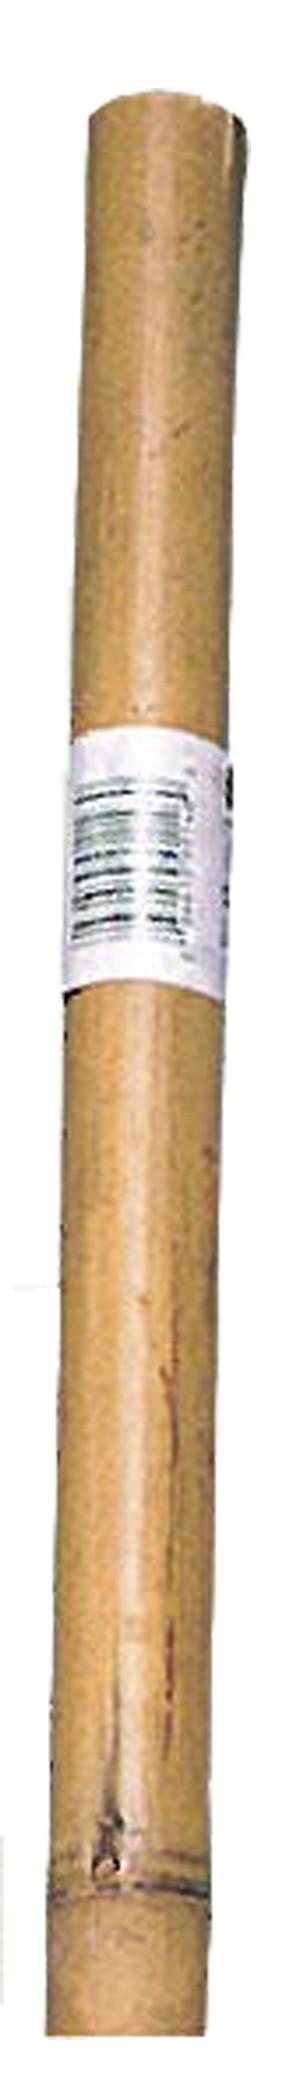 Bond Super Bamboo Pole Brown 10ea/1.25Inx8 ft